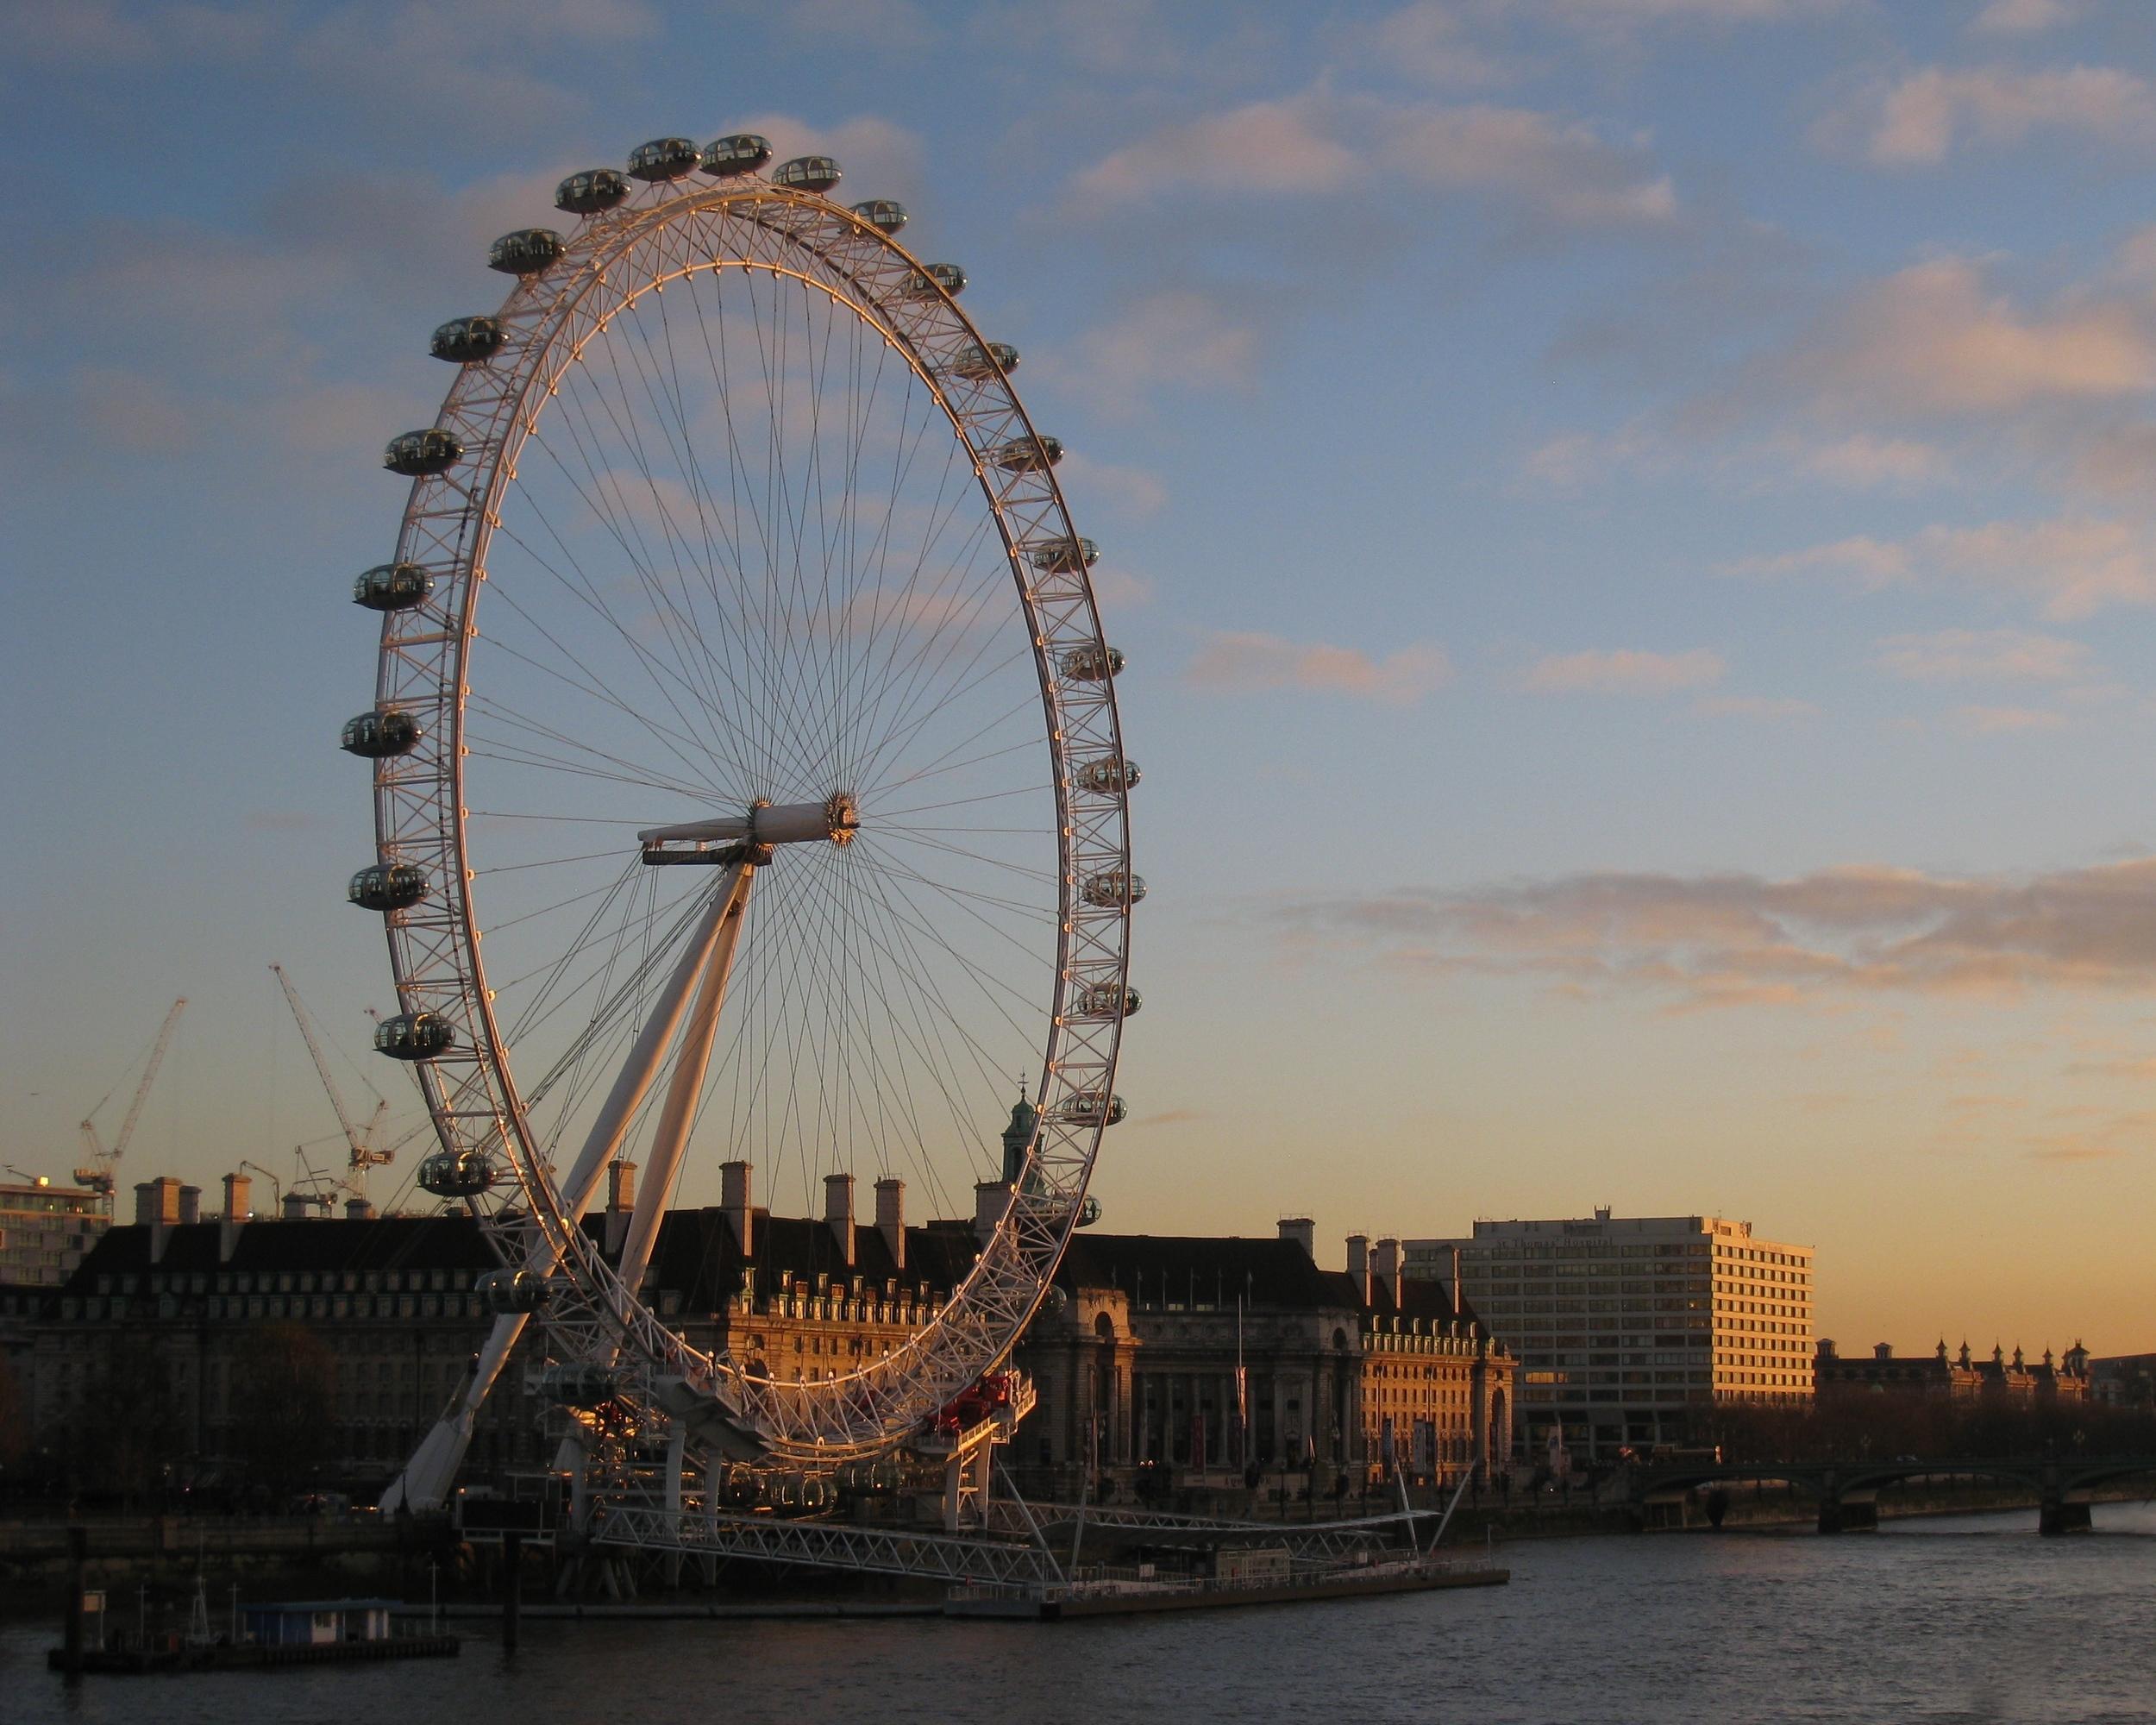 London122008++840+5-664443685-O.jpg